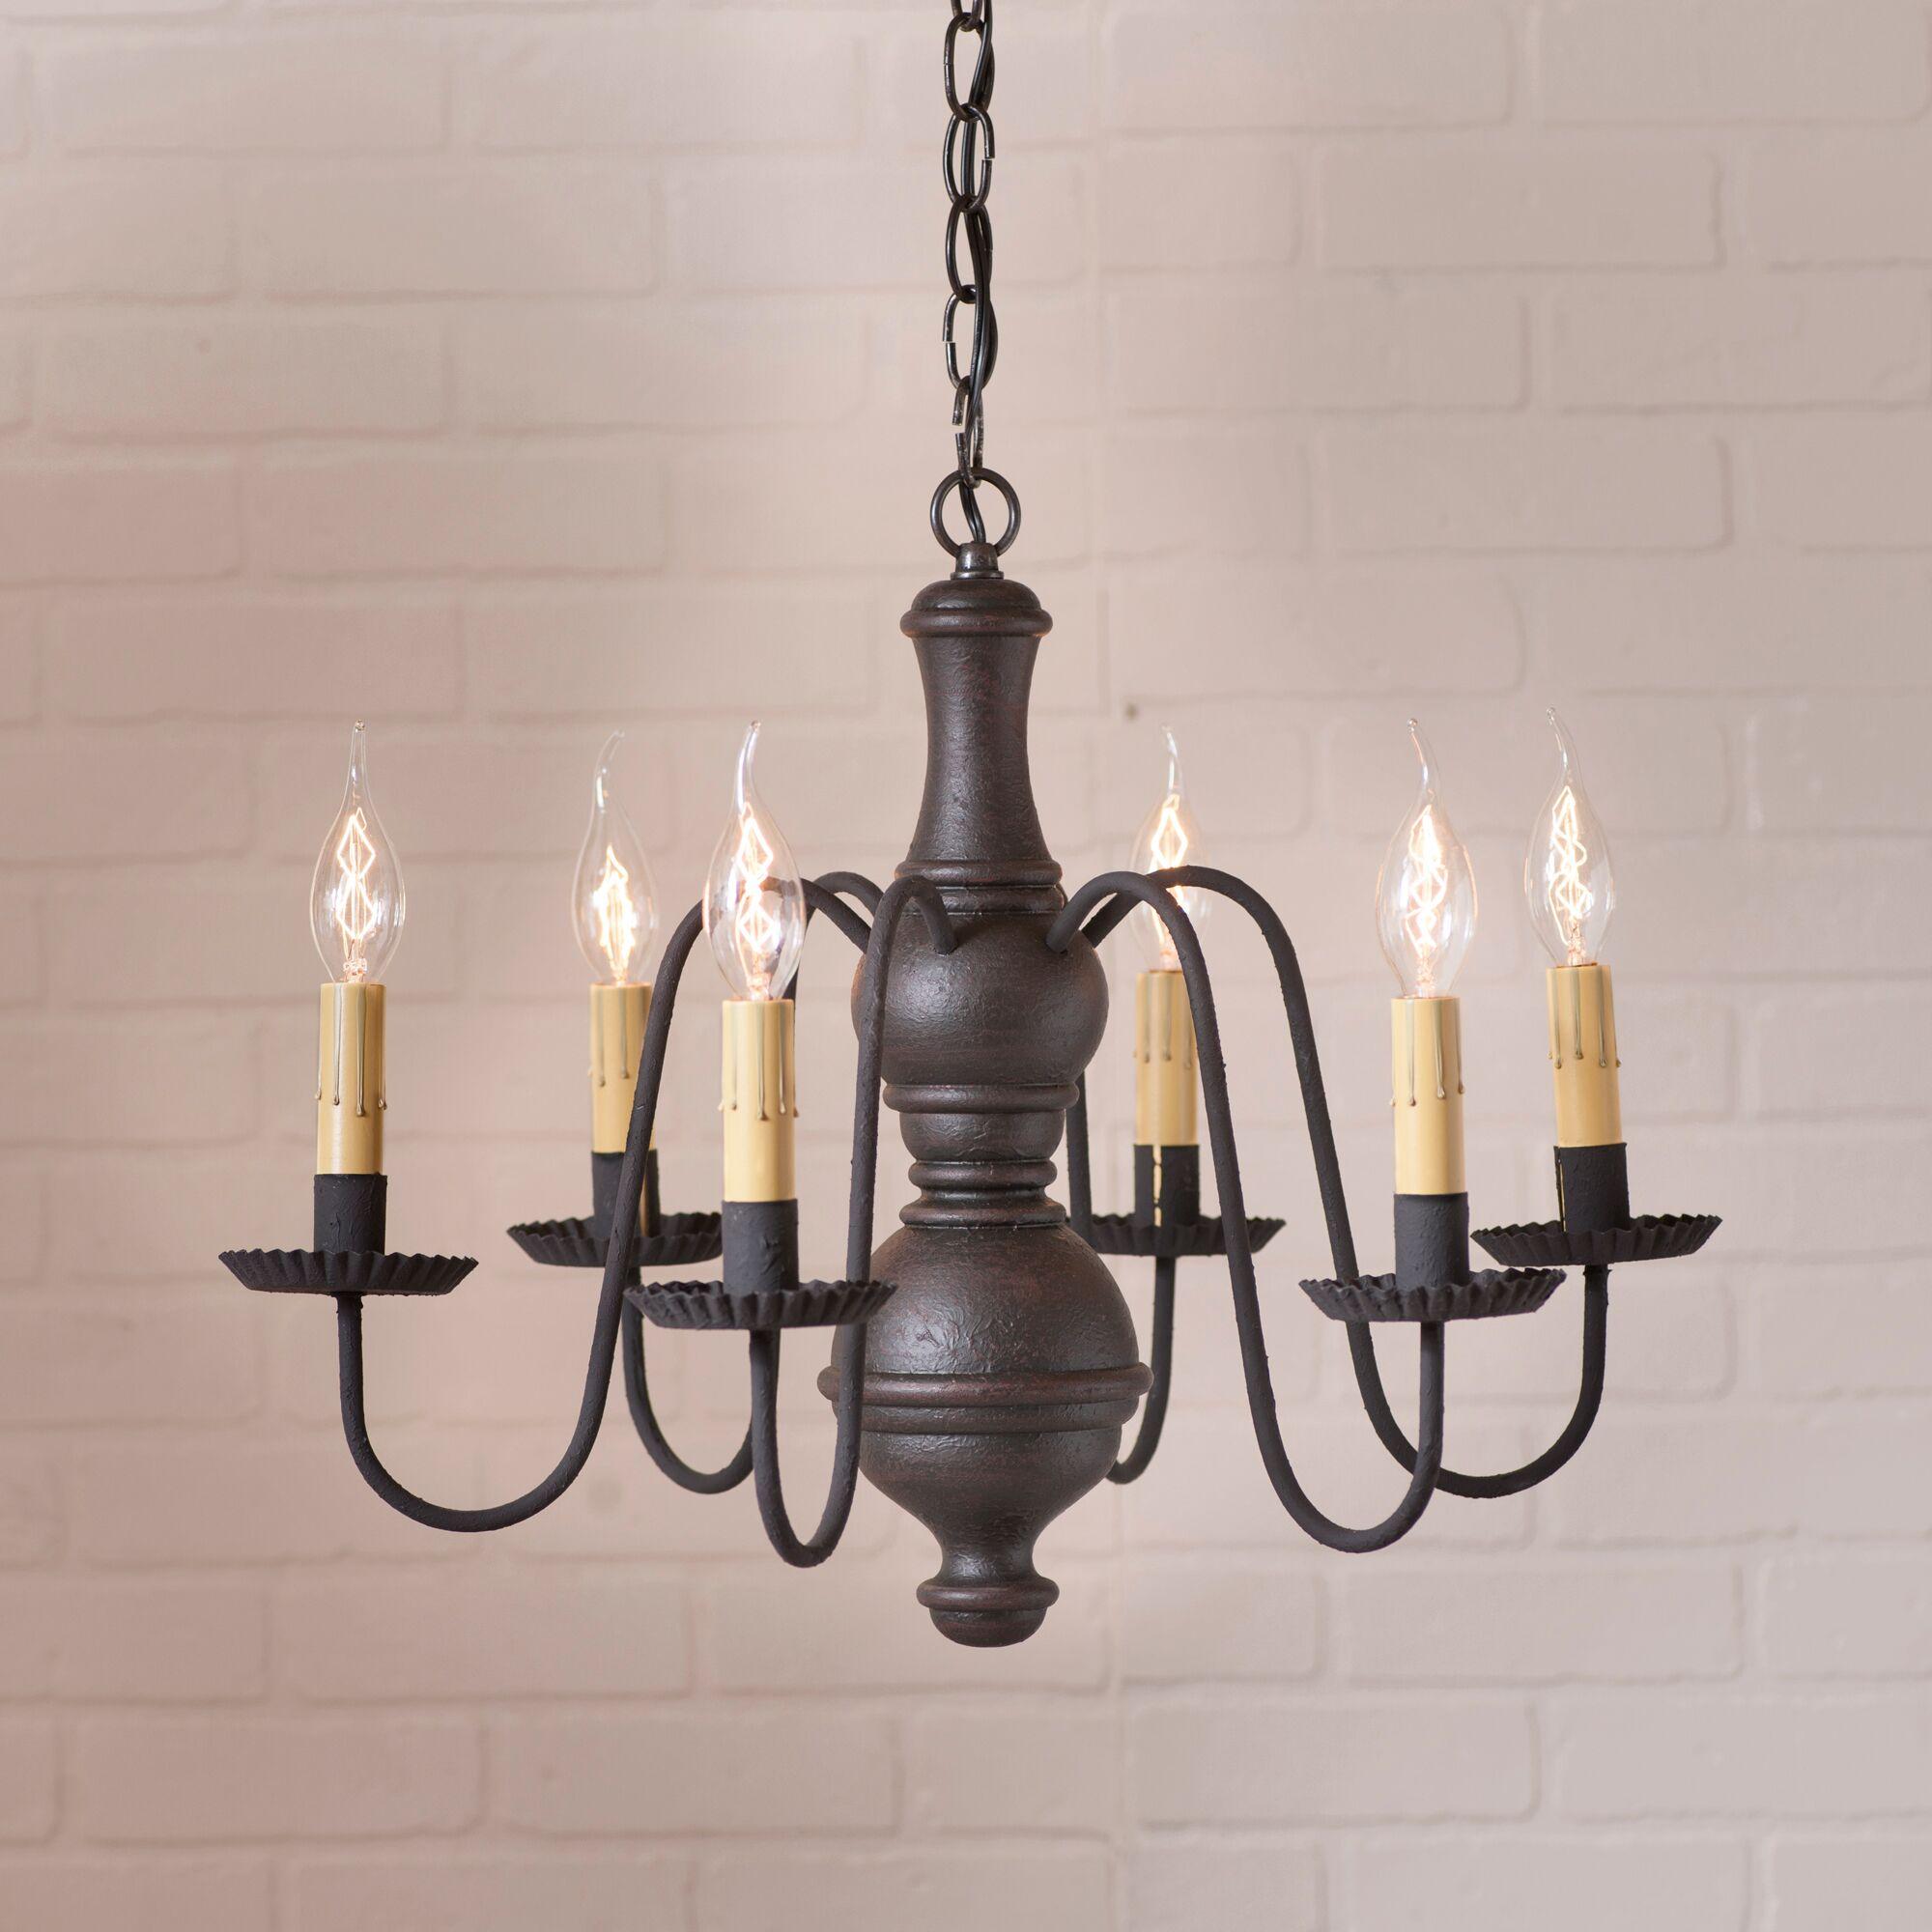 Hurt 6-Light Candle Style Chandelier Finish: Black, Size: 16.5